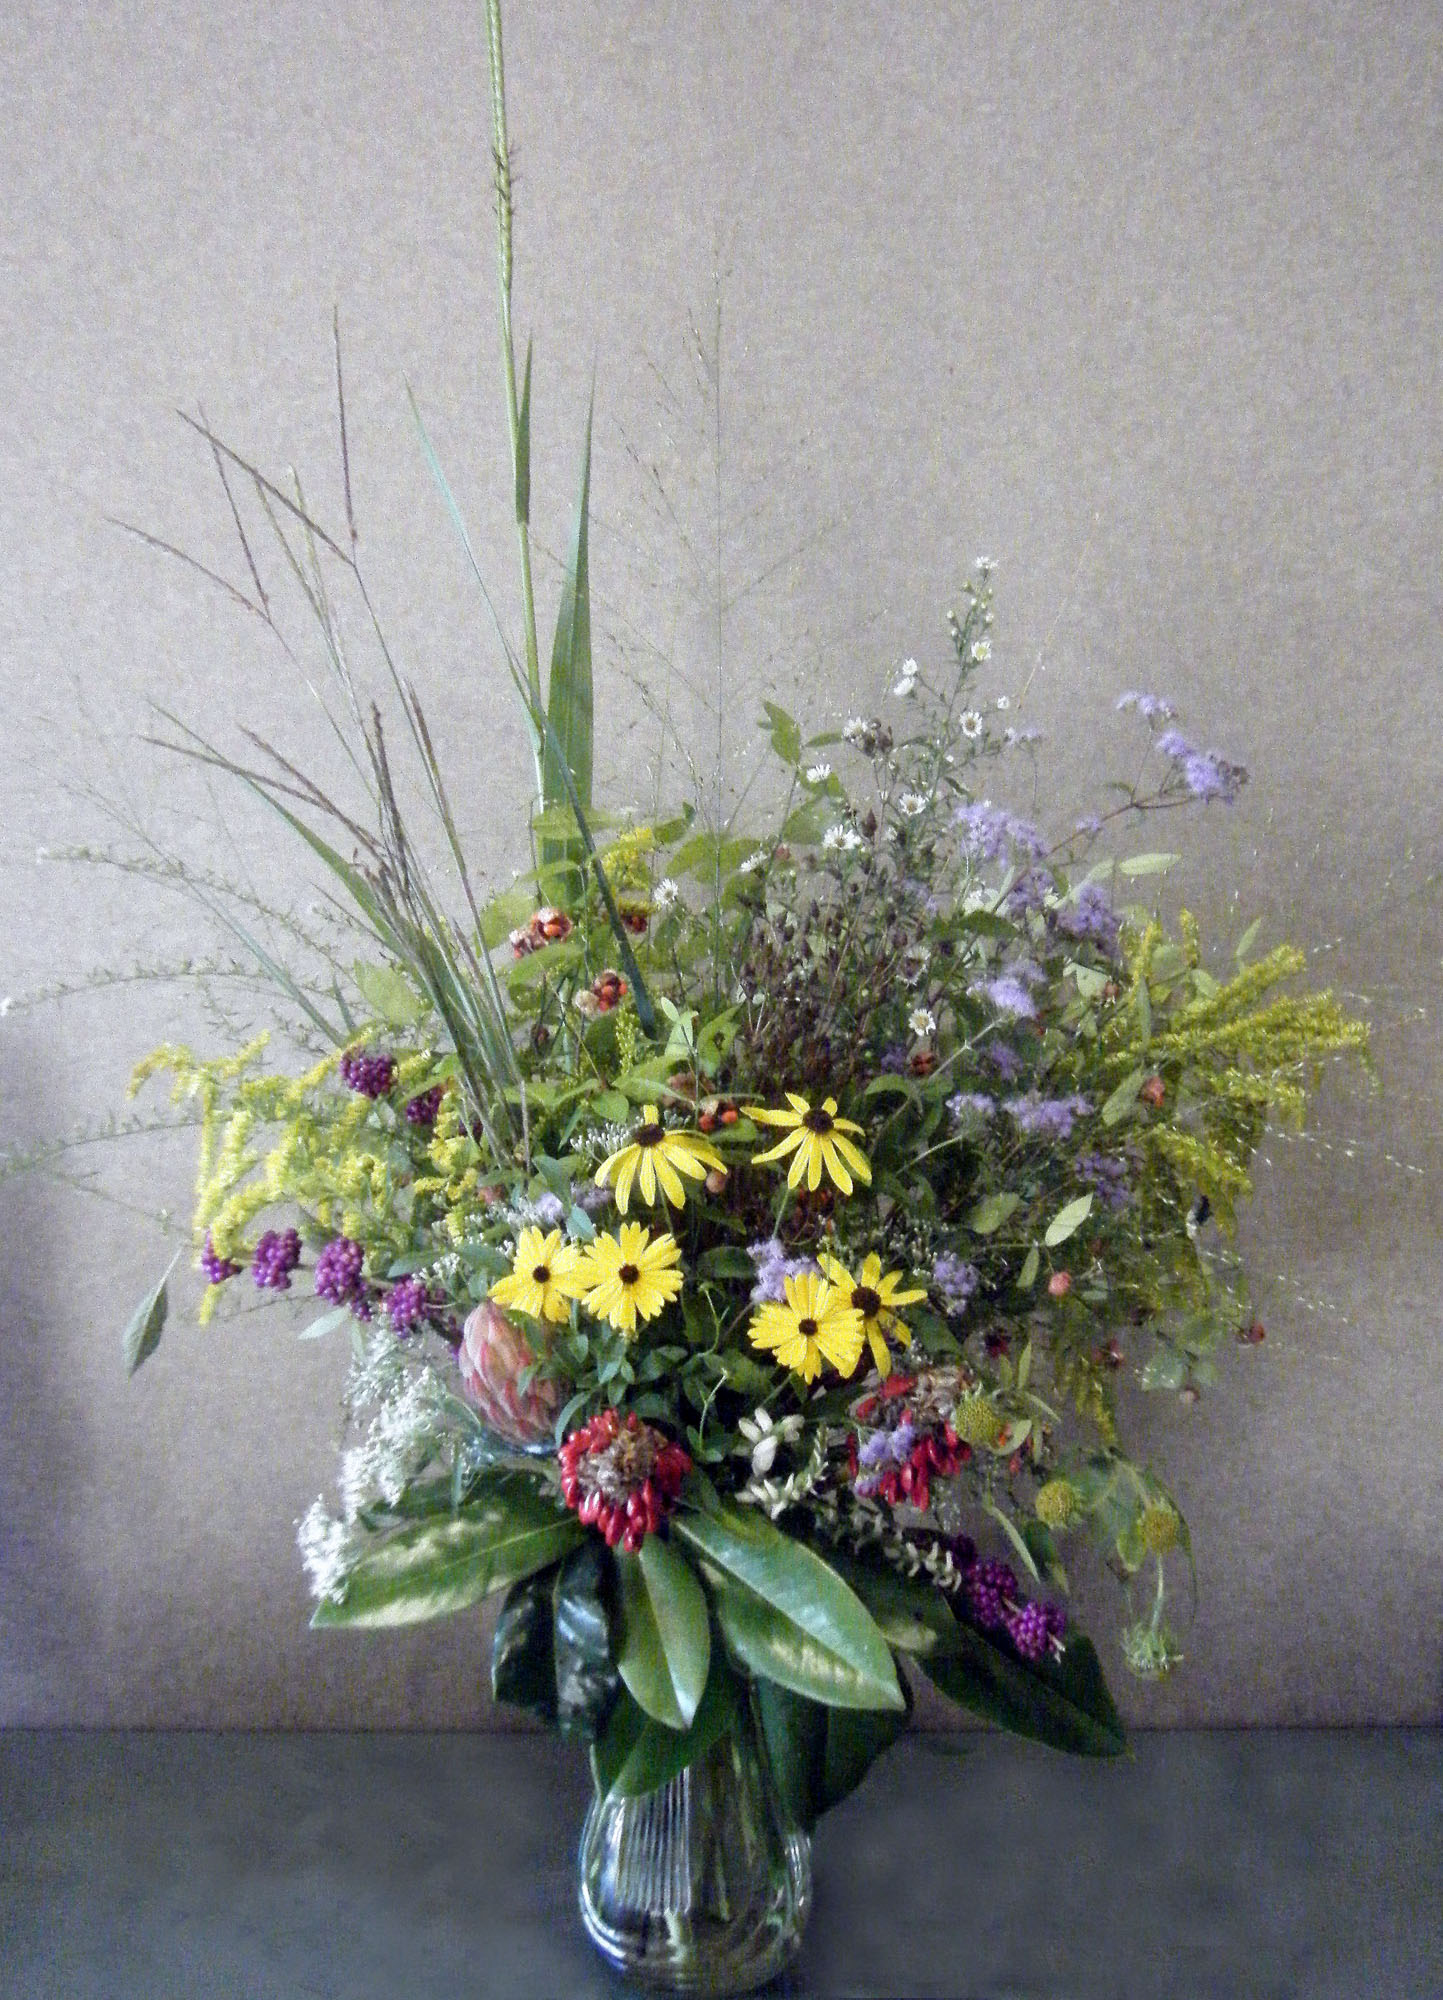 I Made This Wildflower Arrangement ...